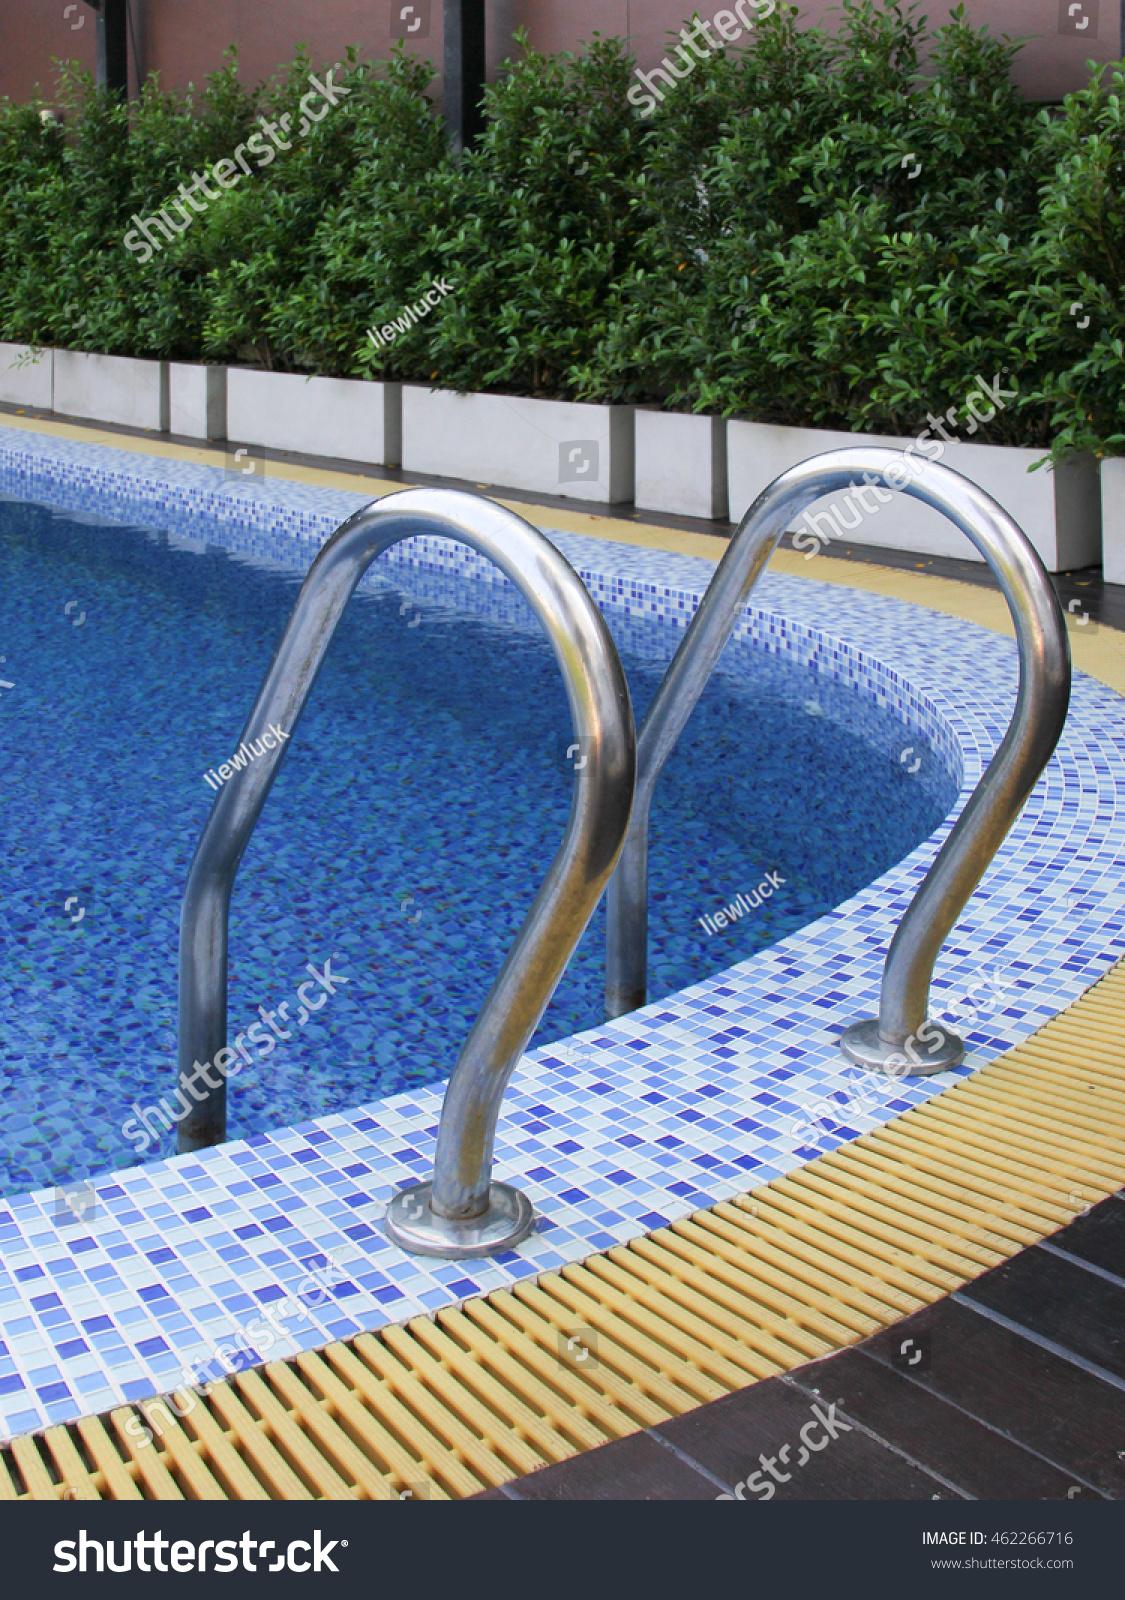 Grab Bars Ladder In Blue Swimming Pool Stock Photo 462266716 Shutterstock